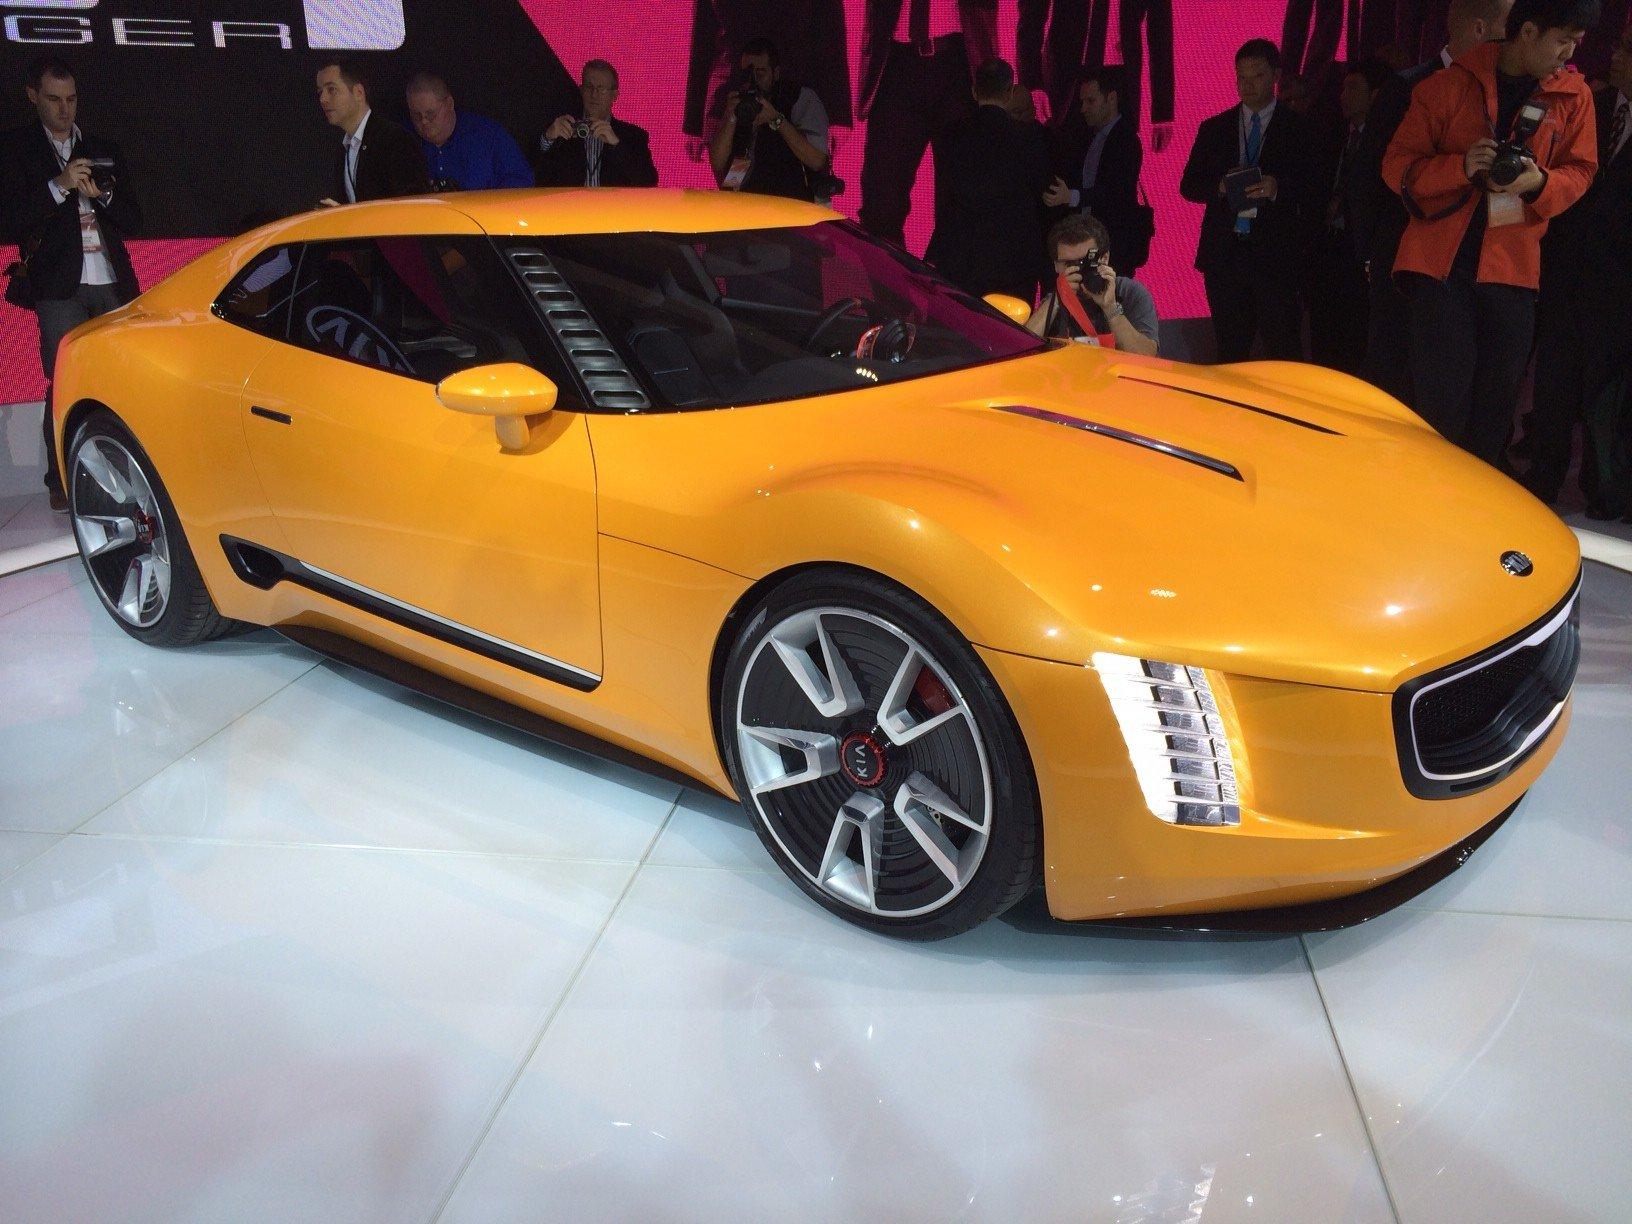 kia gt4 stinger aggressive sports car concept unveiled photos. Black Bedroom Furniture Sets. Home Design Ideas